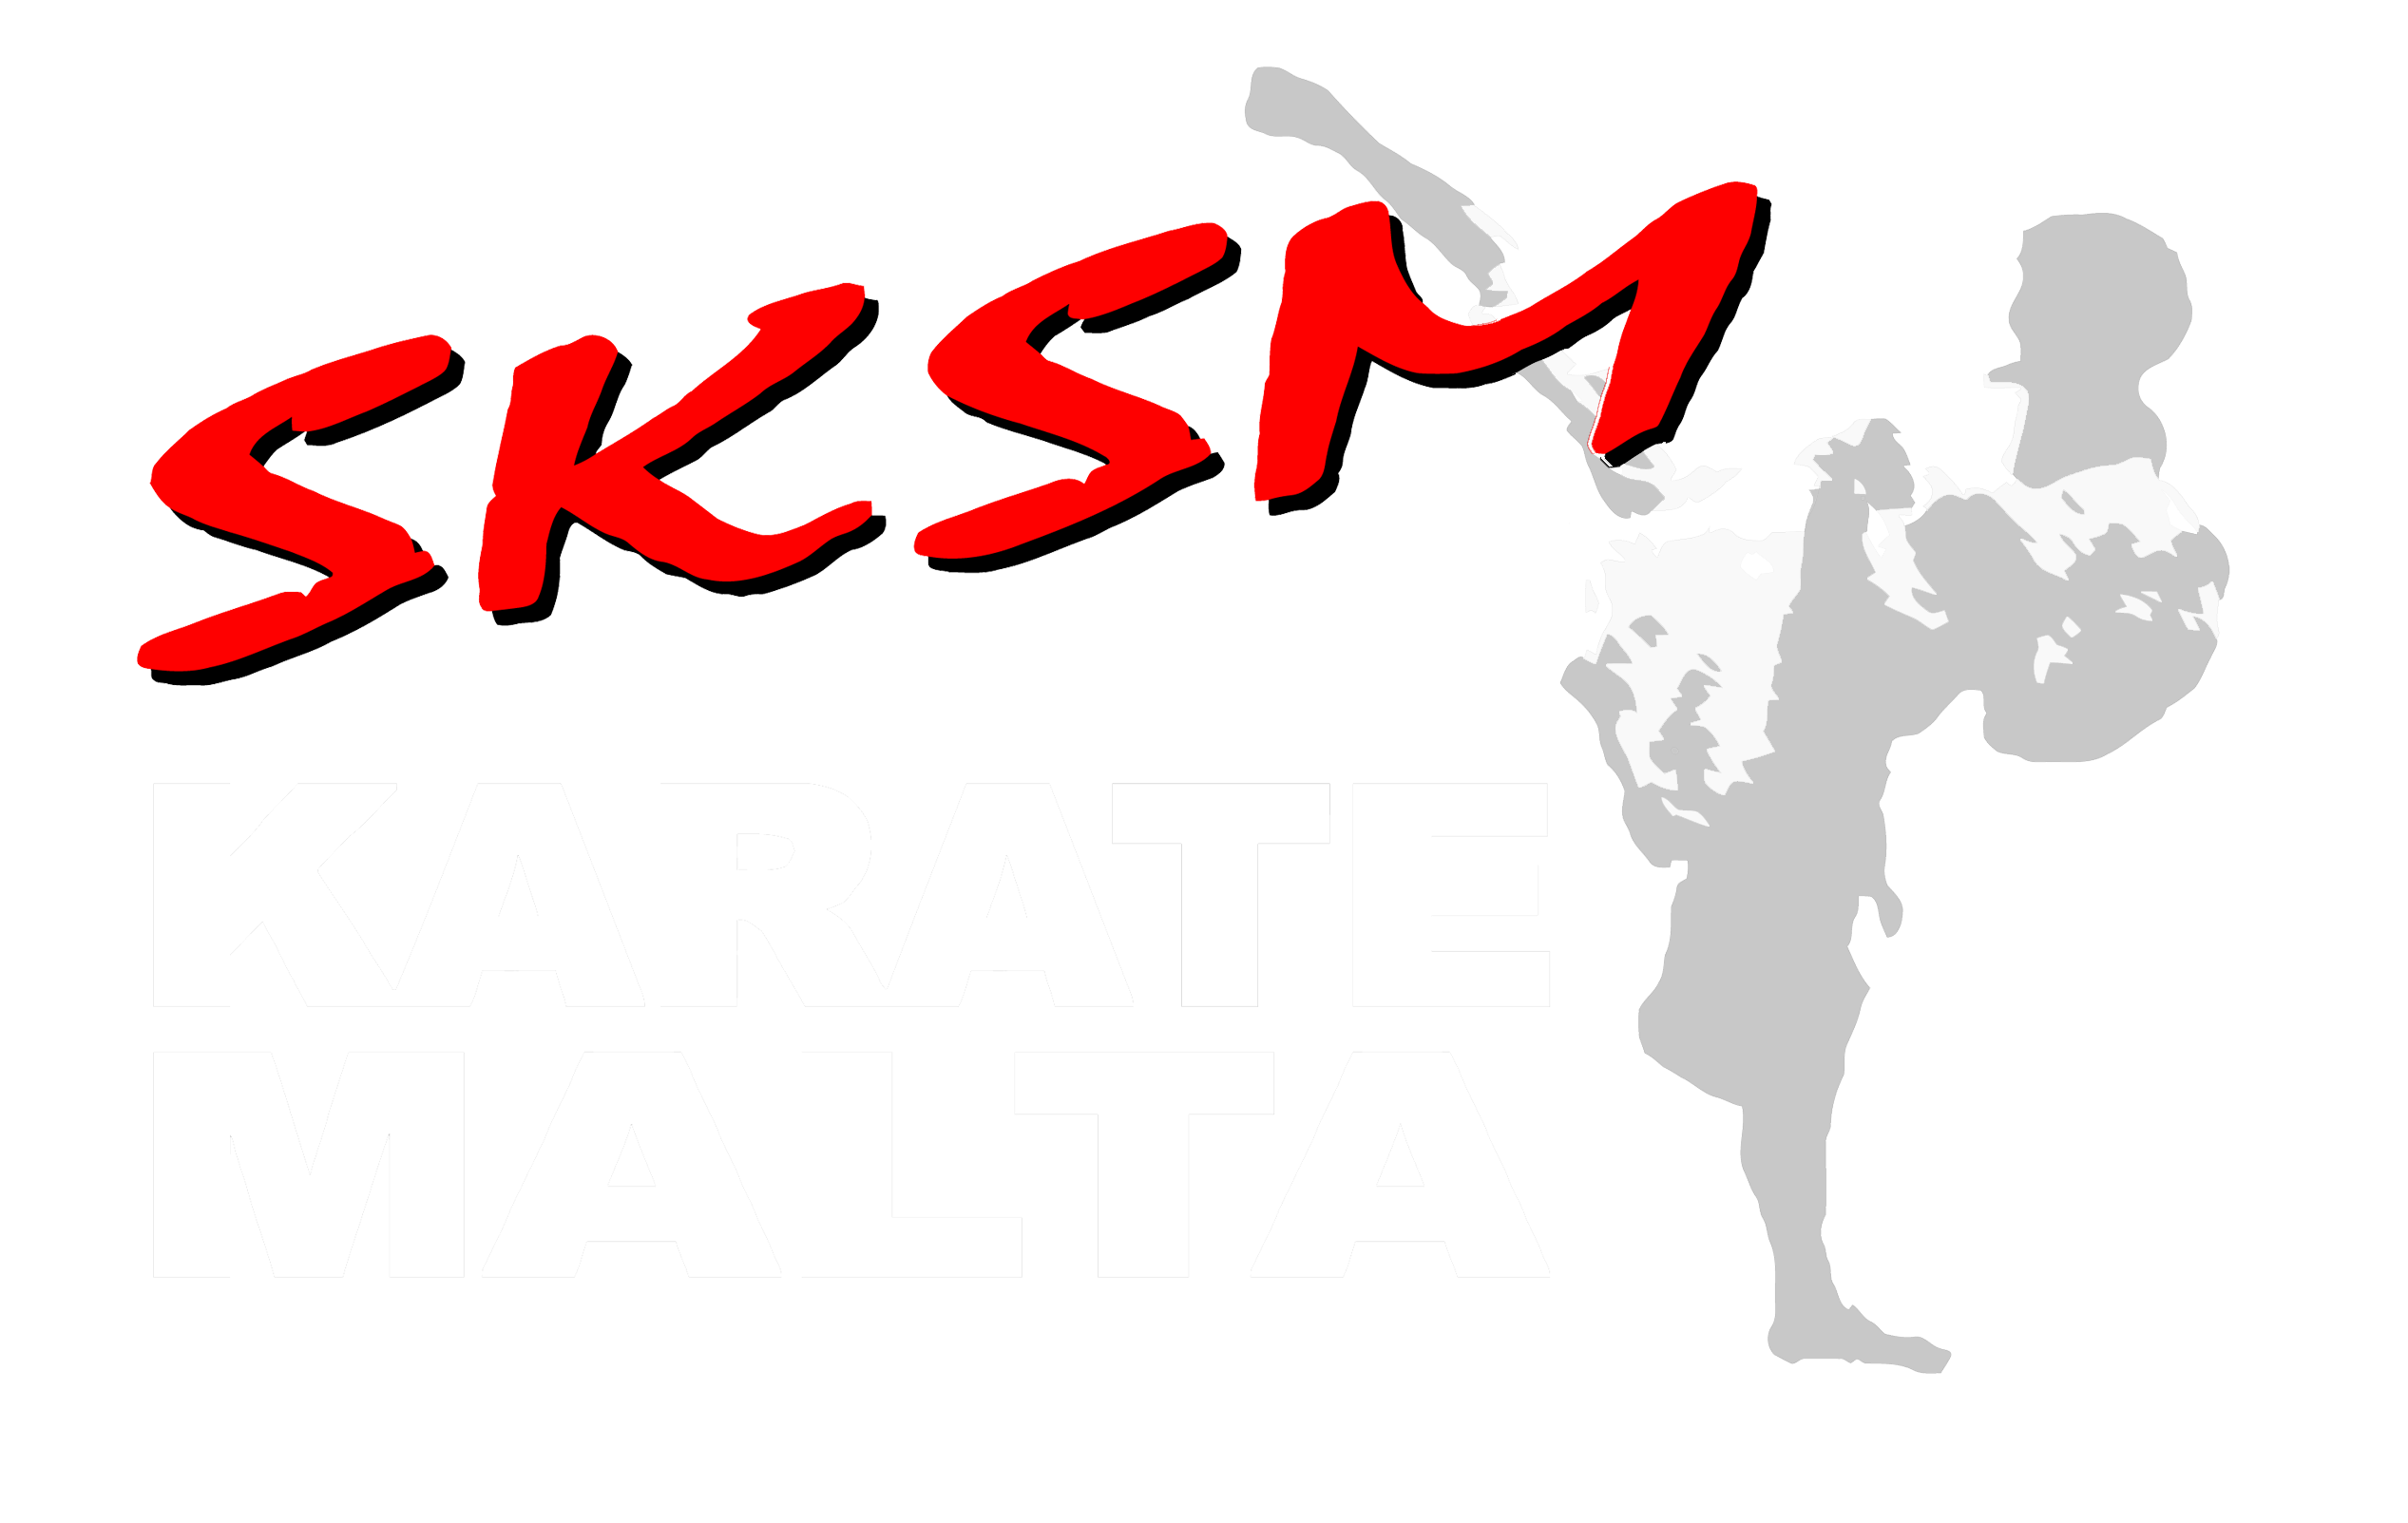 SKSM Karate Malta